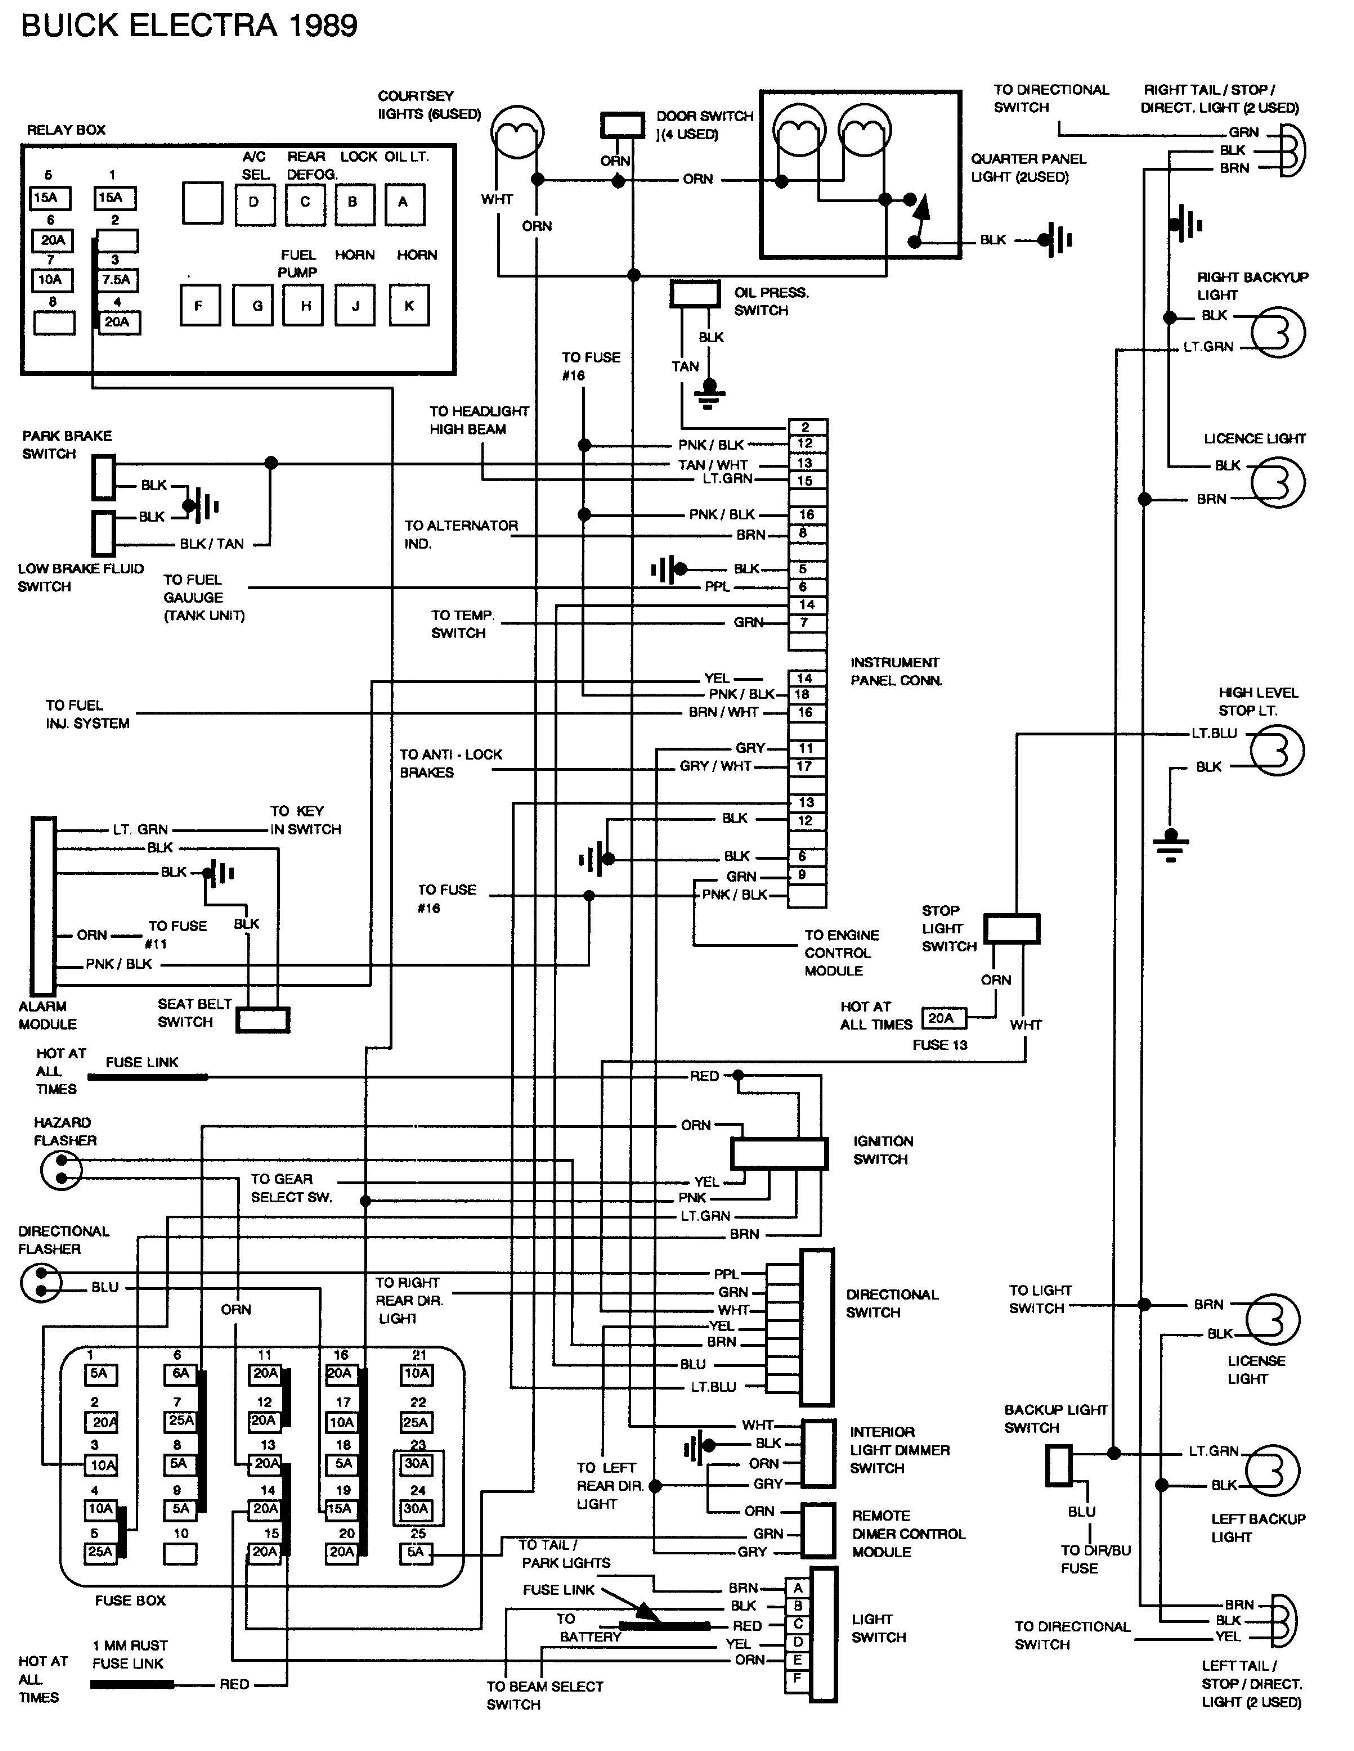 1999 Buick Century Engine Diagram 1999 Buick Riviera Black Pack Fuse Box Diagram Wiring Diagrams • Of 1999 Buick Century Engine Diagram the original Mechanic 3 1l Engine Gm Replacing Intake Manifold